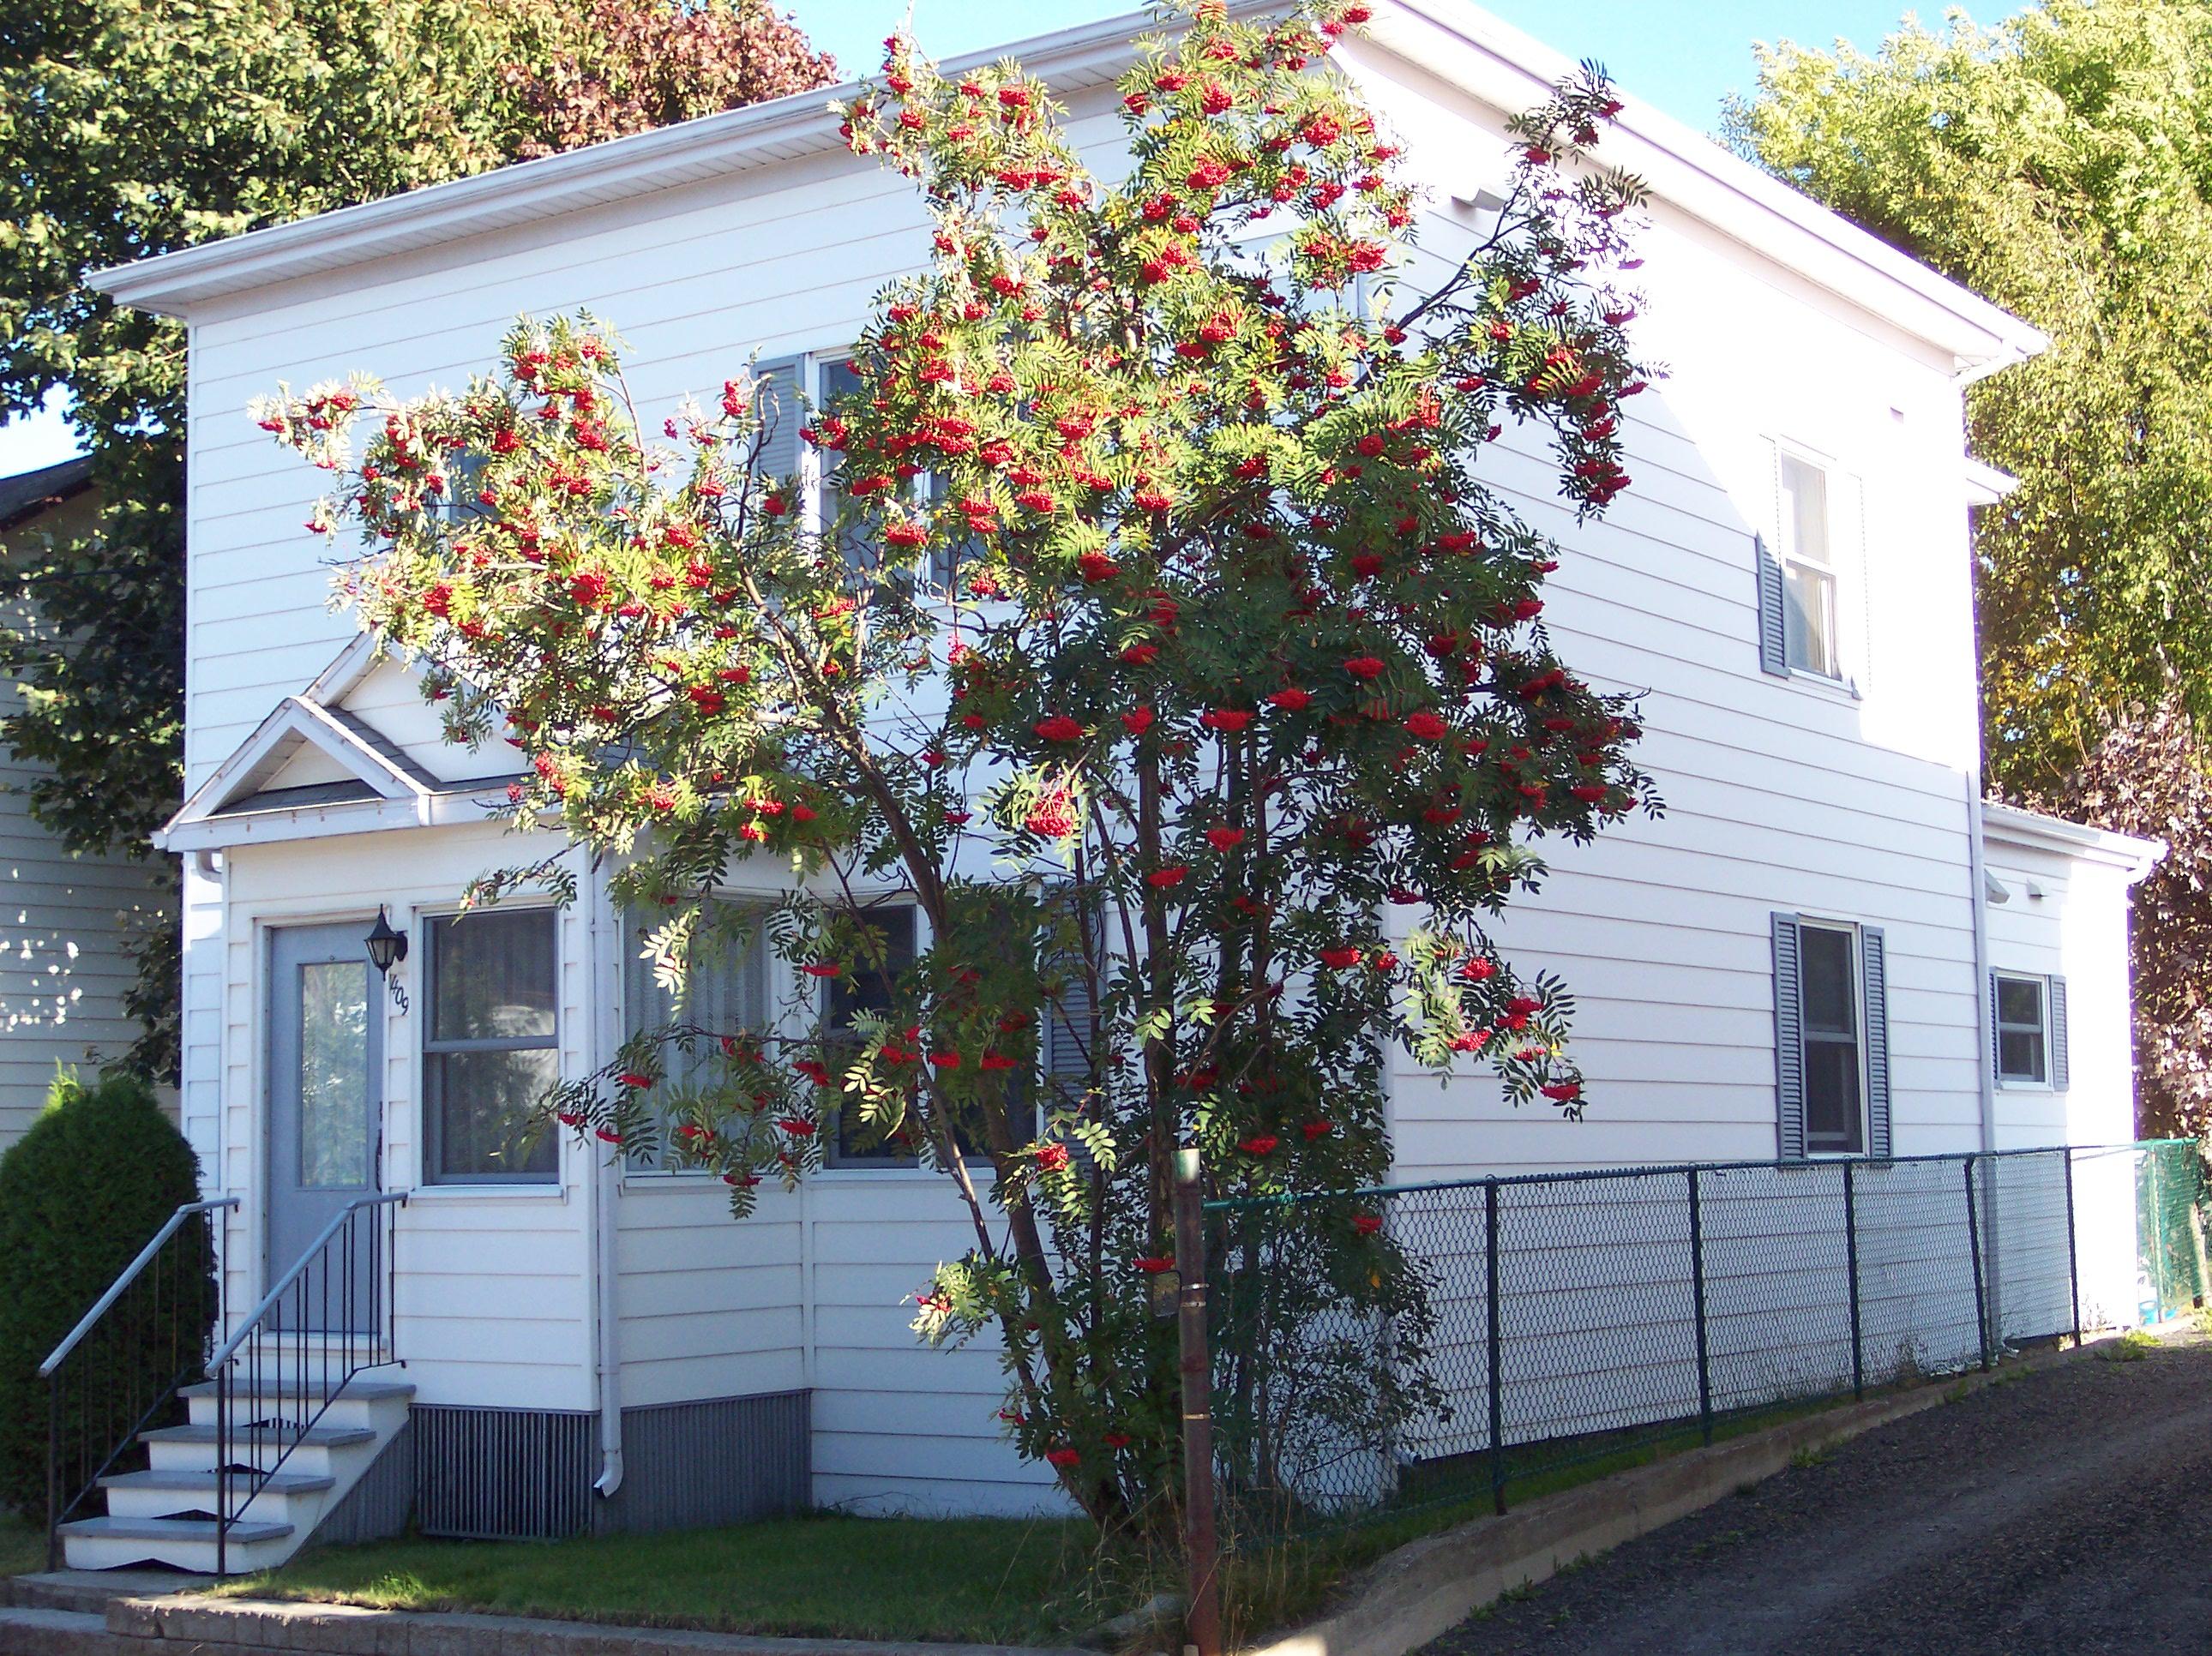 1746 - 407-409, rue La Salle